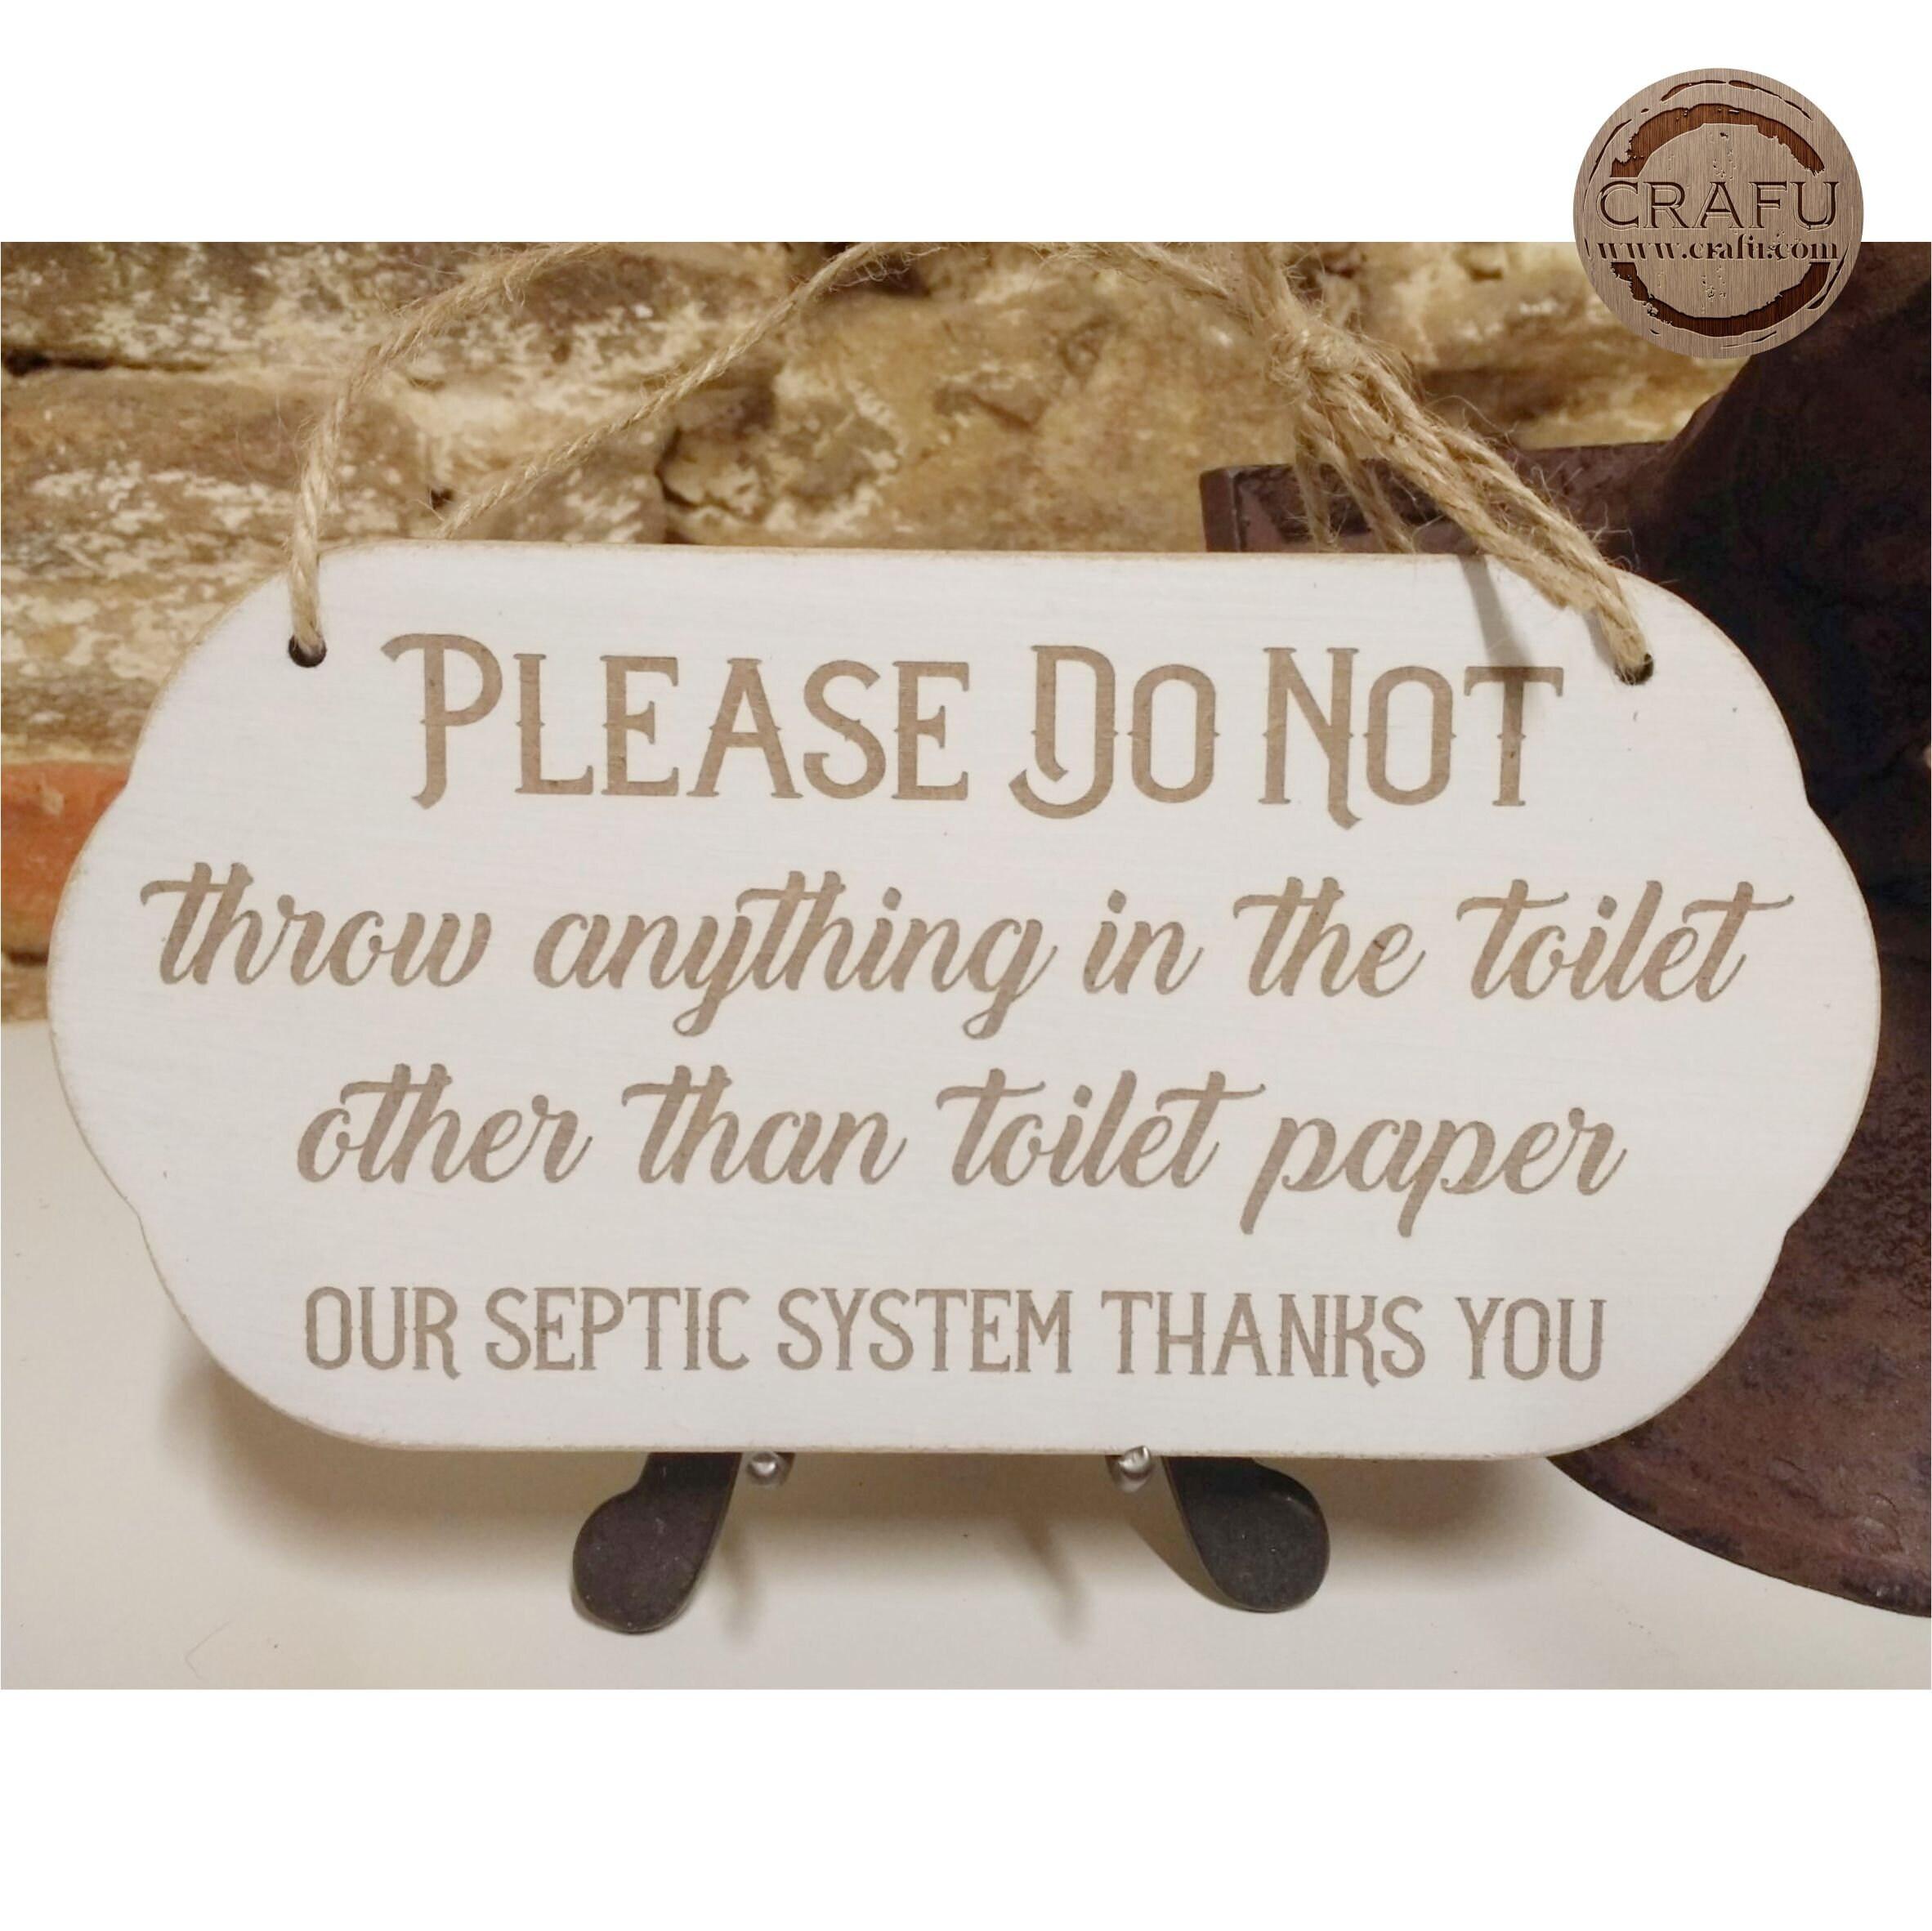 Bathroom Rules Sign Flush Toilet Paper, Bathroom Rules Plaque